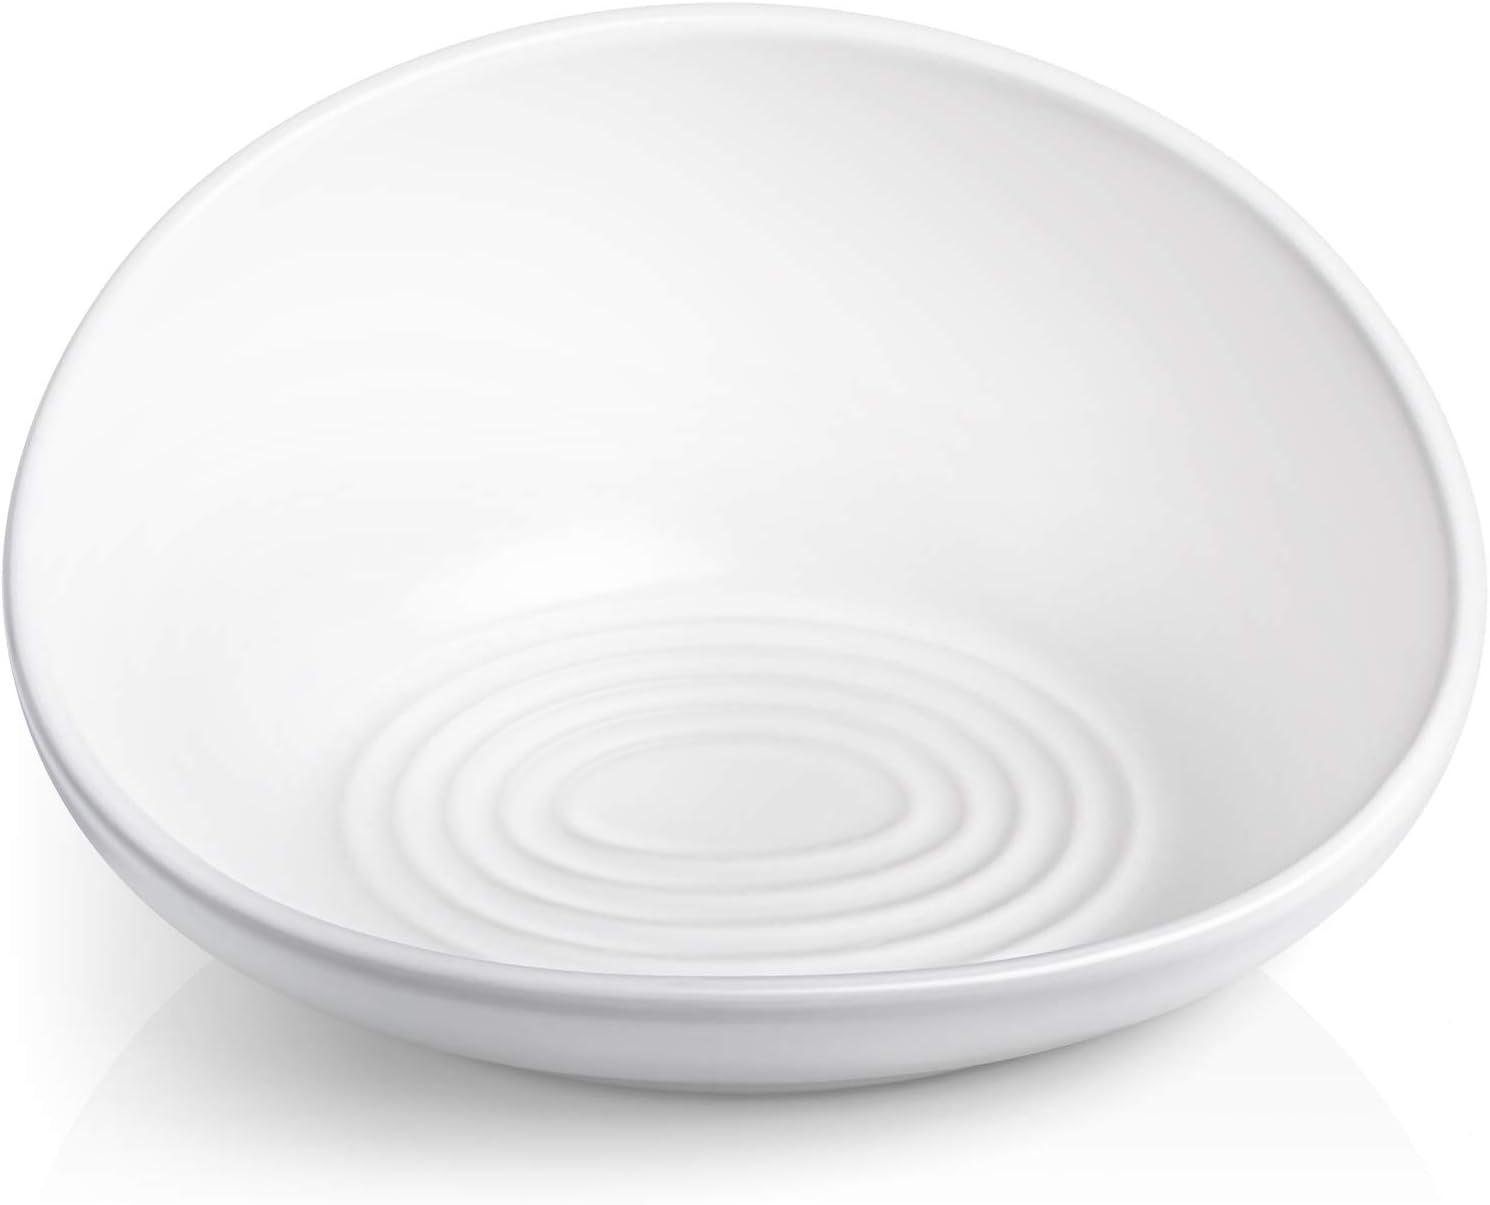 CatGuru Ceramic Cat Food Bowl, Premium Cat Bowls, No Spill Cat Food Bowls, Whisker Stress Free Cat Bowl, Reliefs Whisker Fatigue, Non Skid Pet Bowls for Cats, Includes Silicone Pet Food Mat